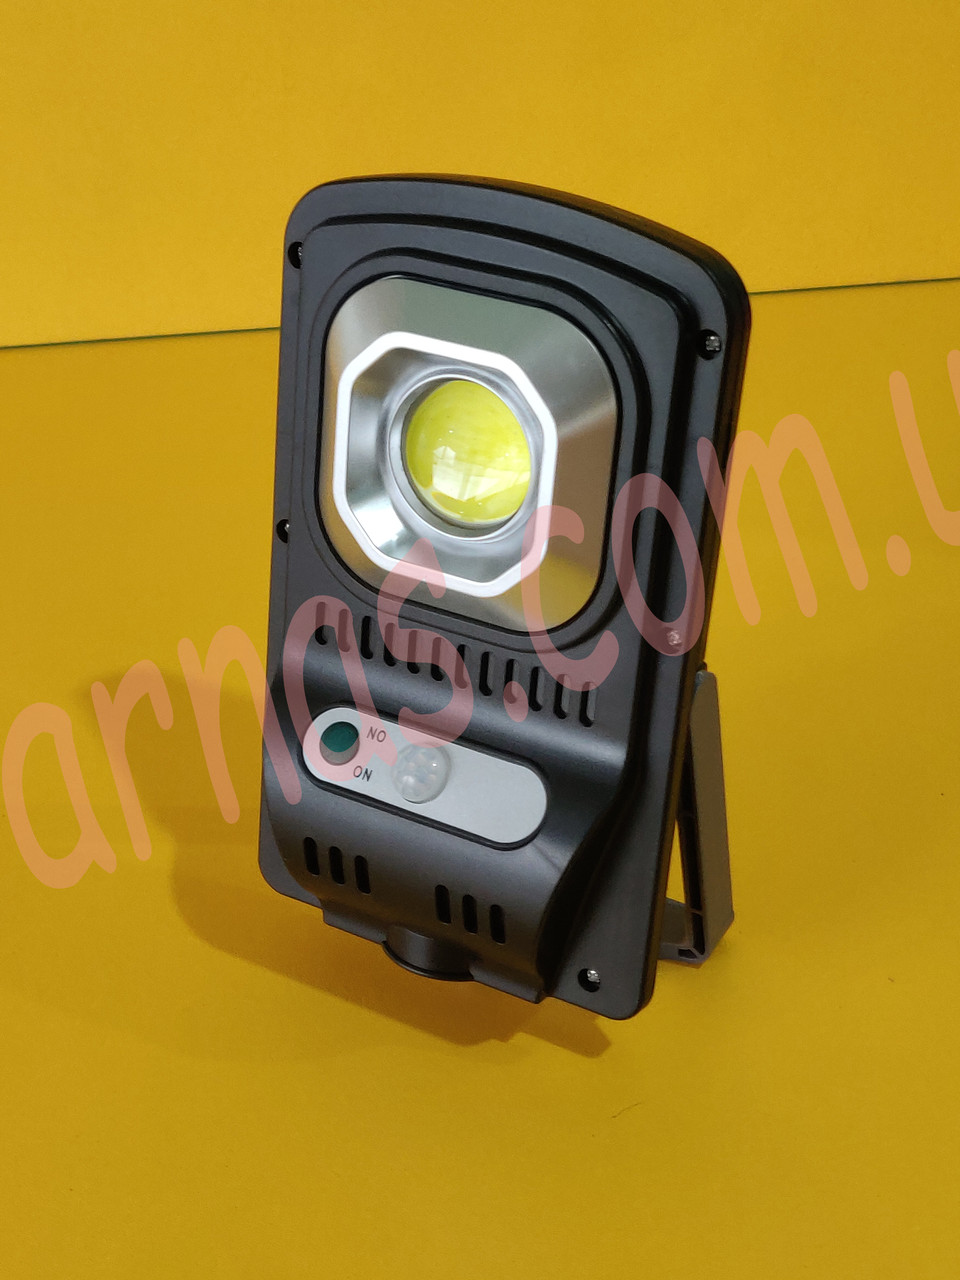 Светильник Multi-function lighting JX-116